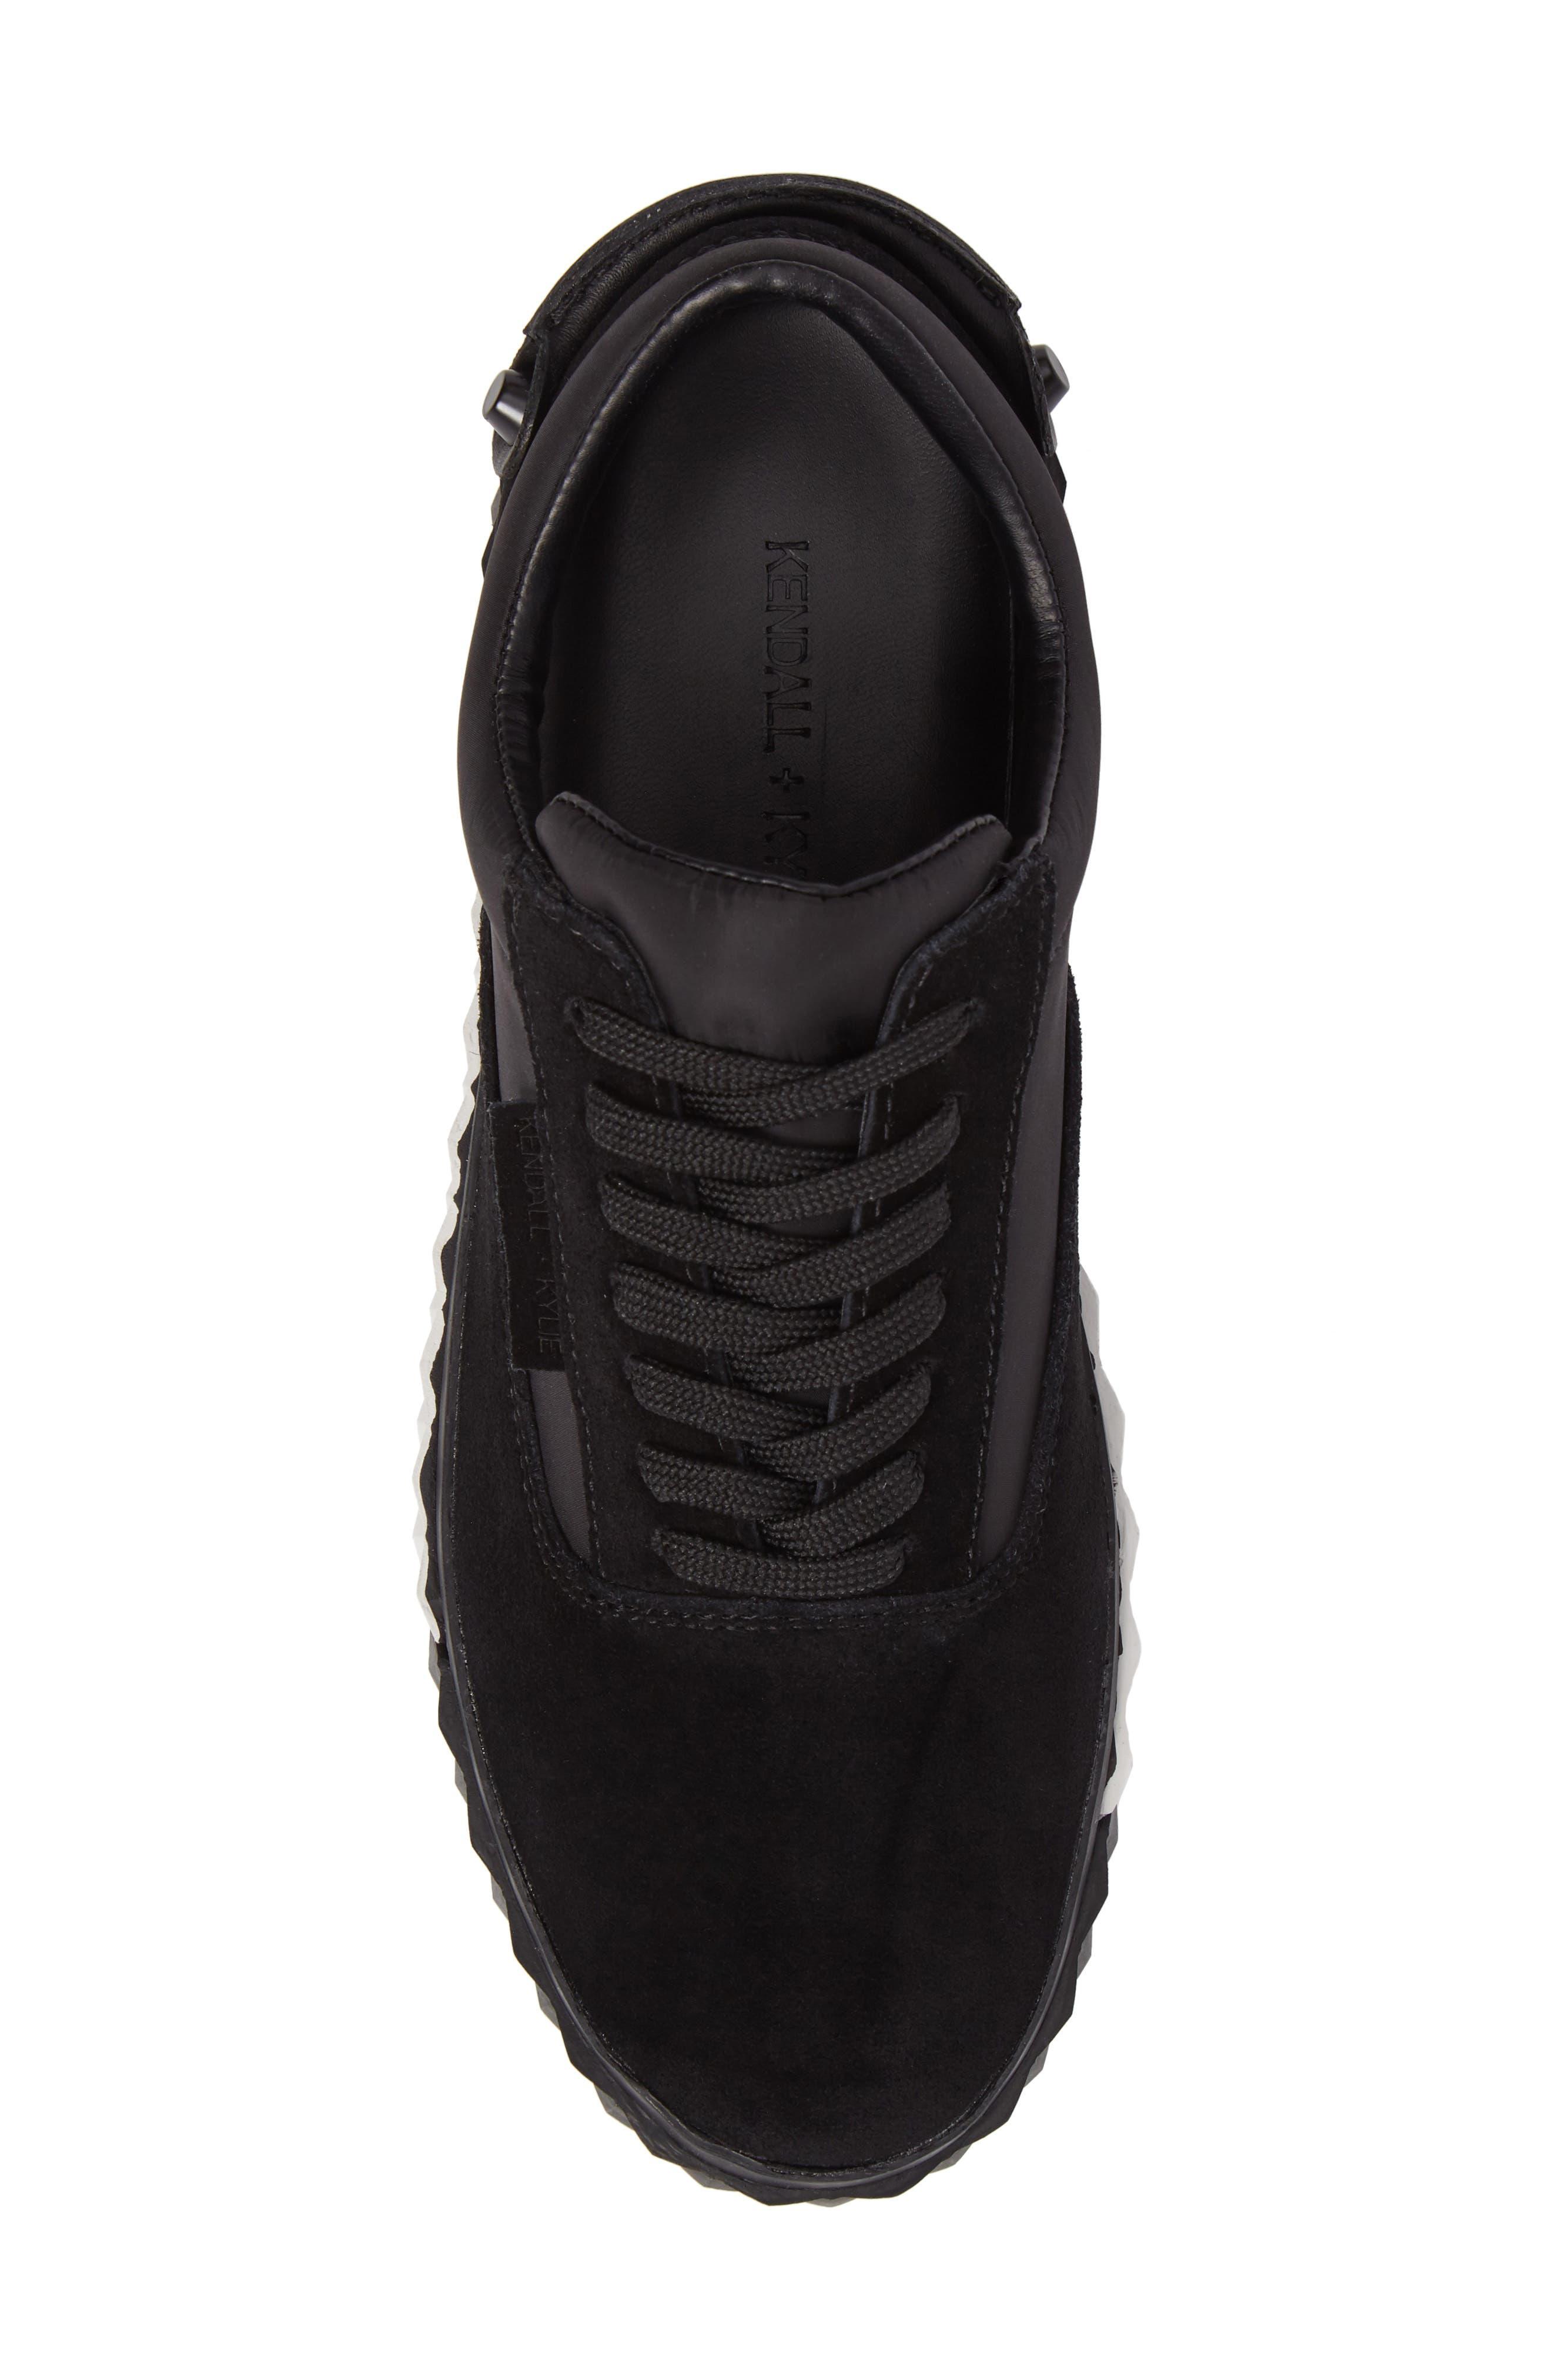 Reign Platform Sneaker,                             Alternate thumbnail 5, color,                             005